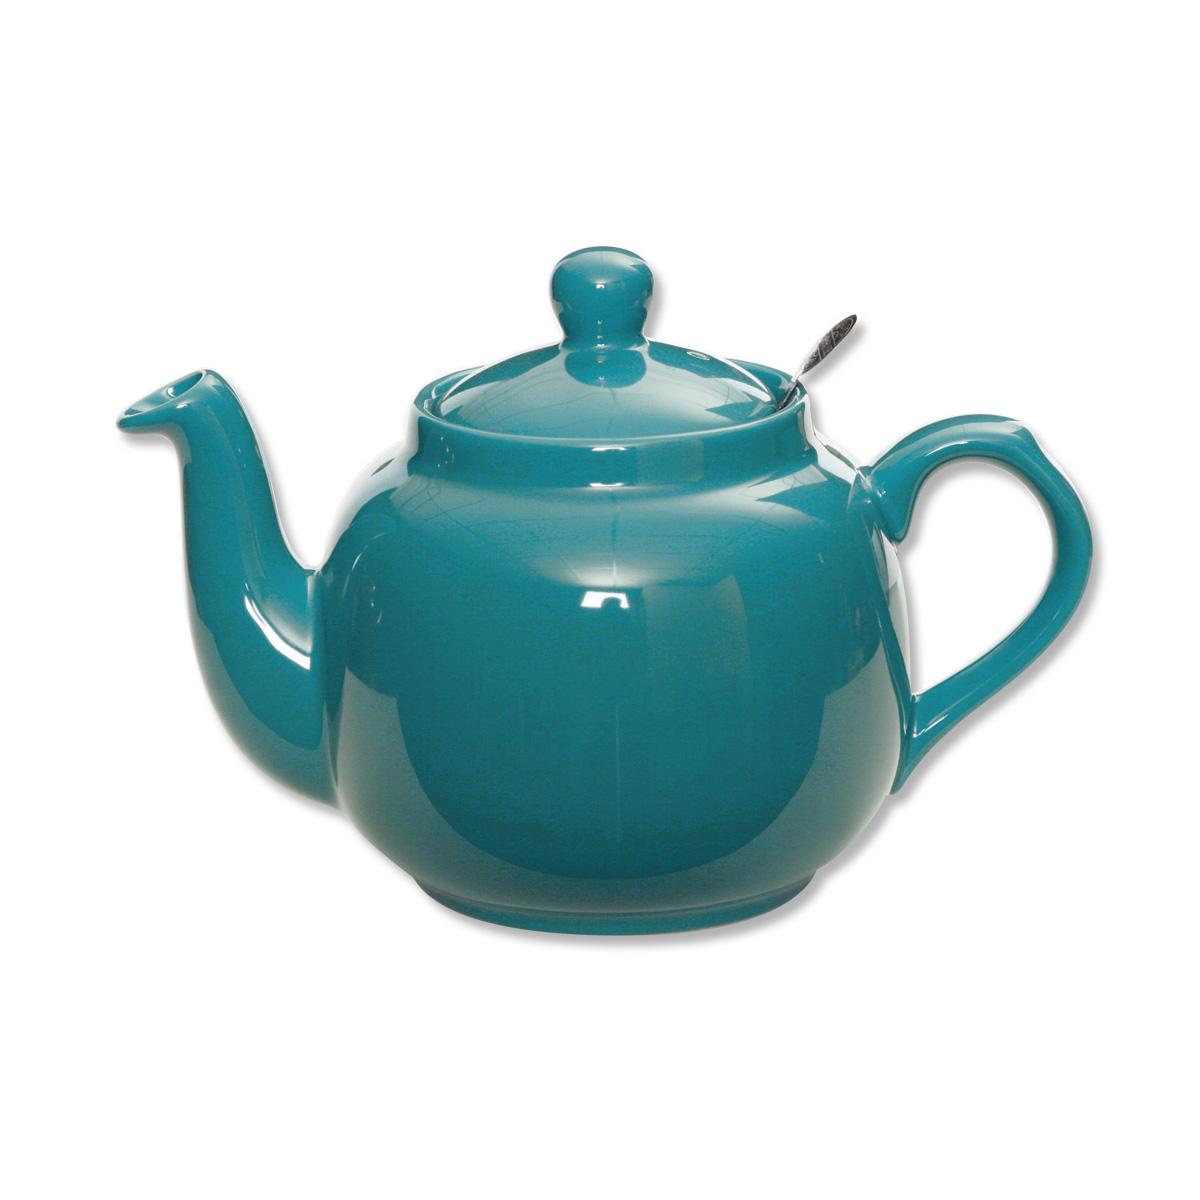 Th i re bleue en fa ence 1 5l design anglais bruno evrard for Faience bleu canard